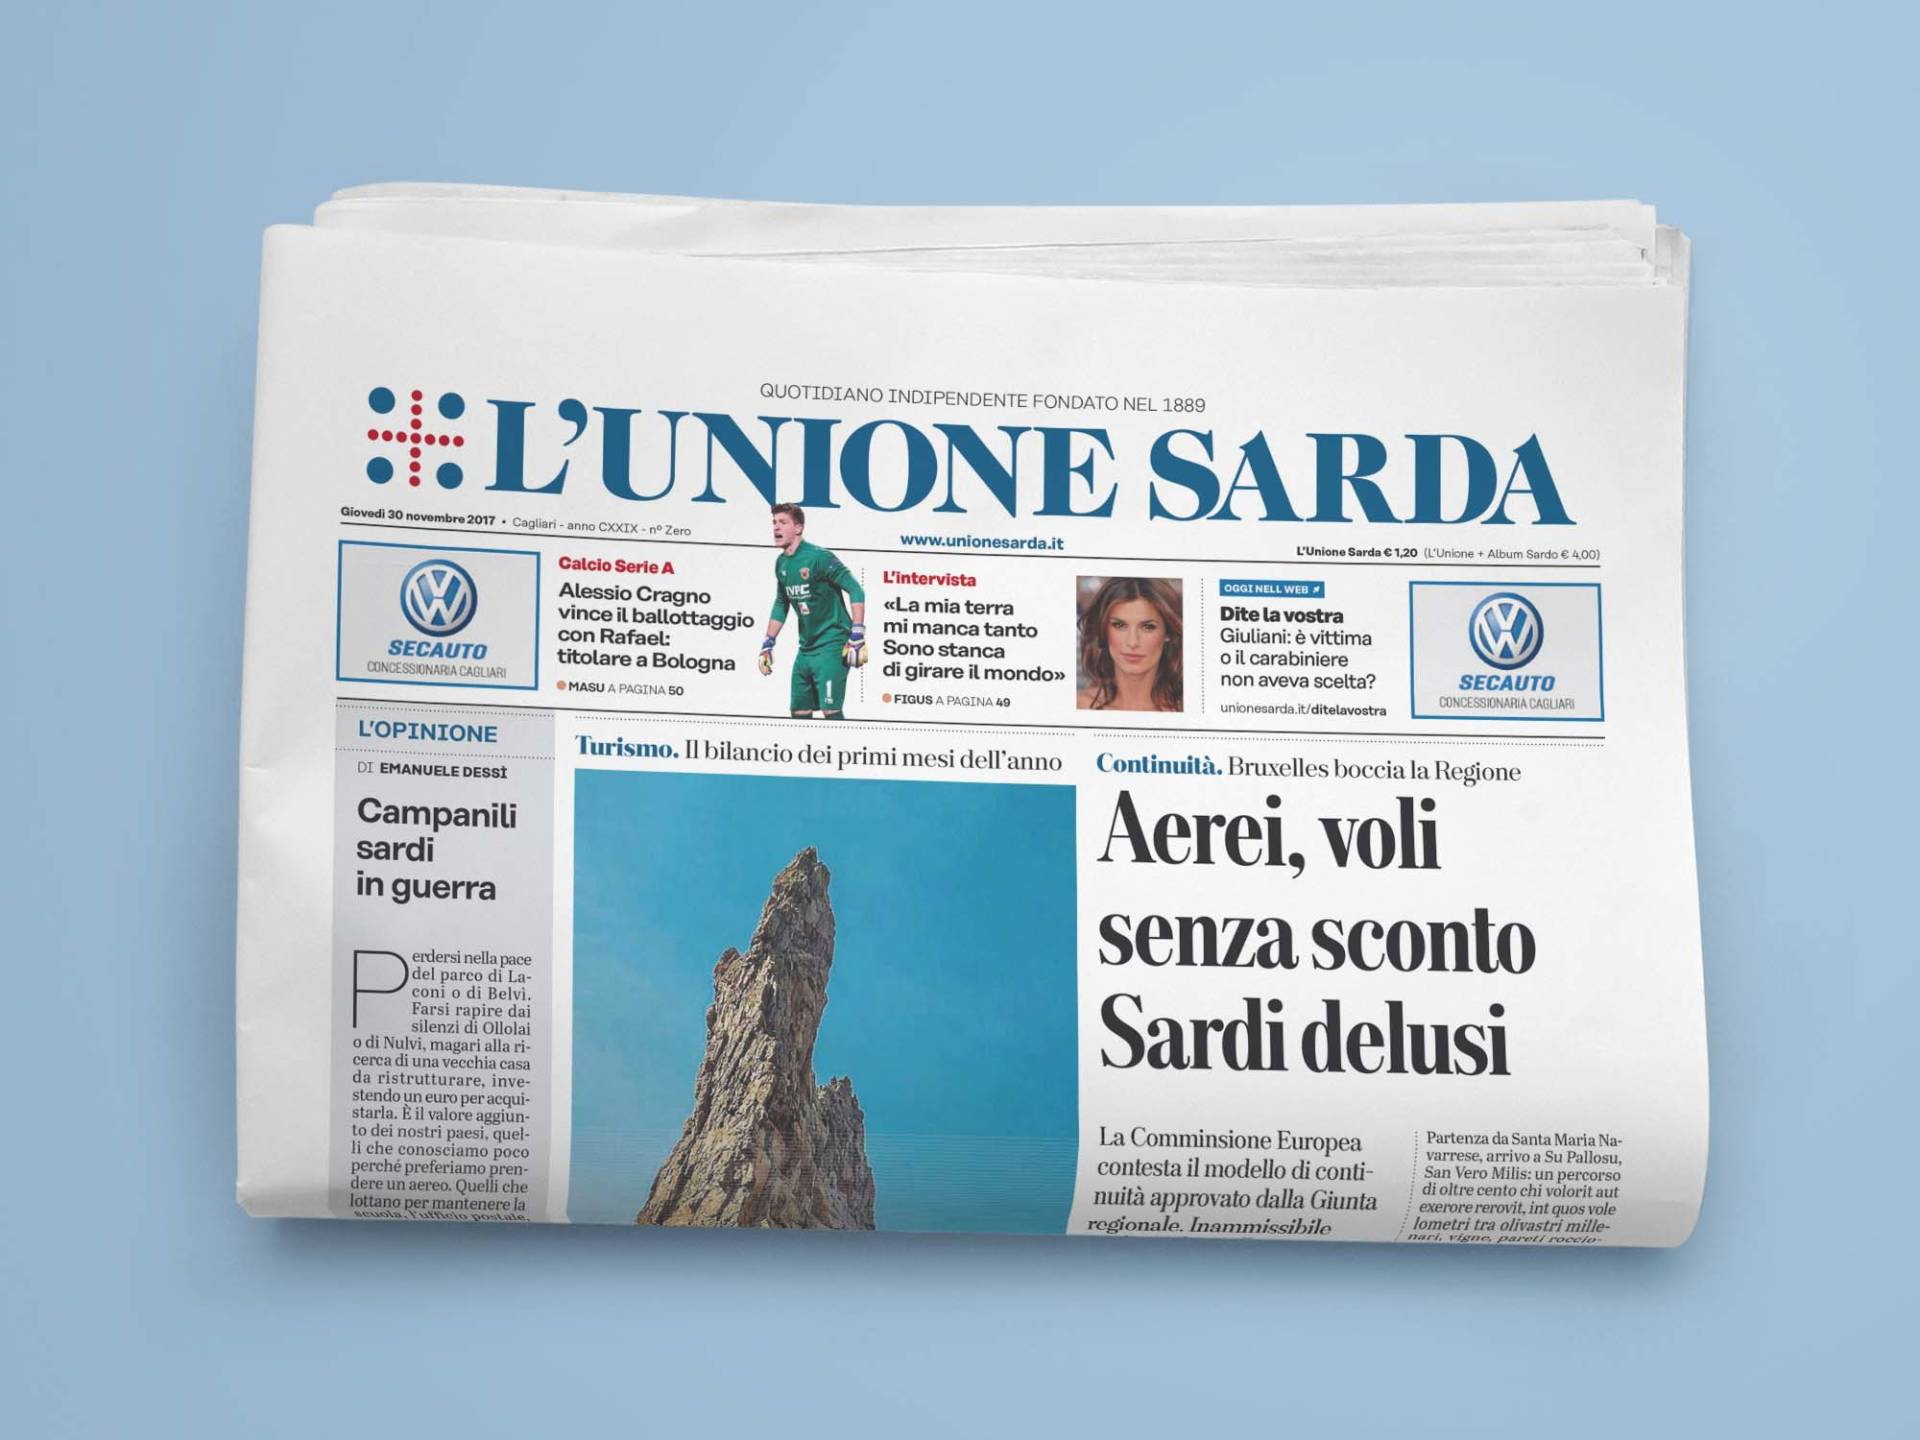 L'Unione_Sarda_01_Wenceslau_News_Design